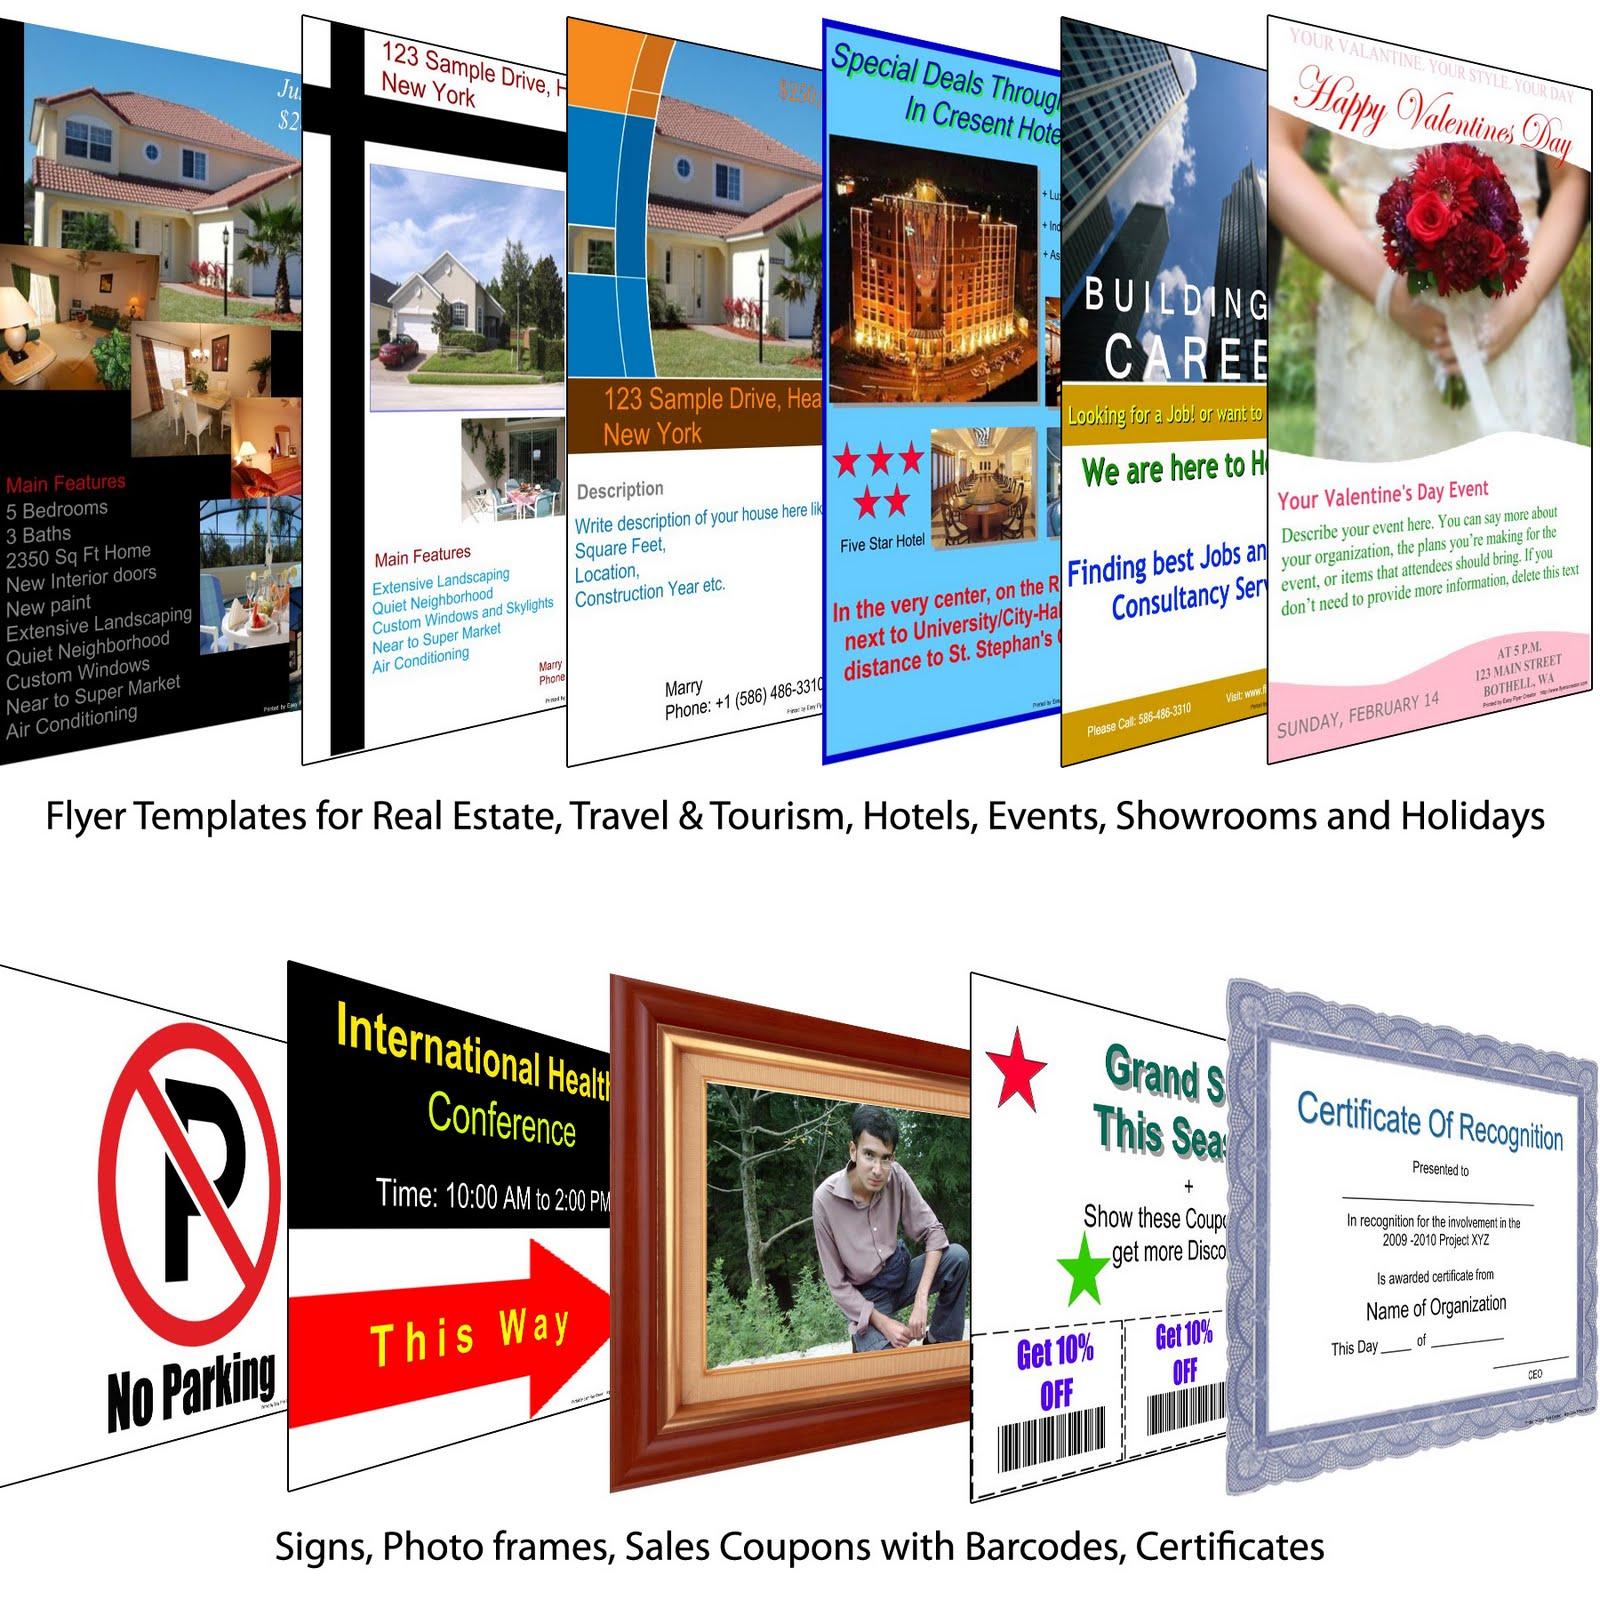 Vacation Brochure Template brochure brochure template word free – Free Brochure Templates for Word 2007